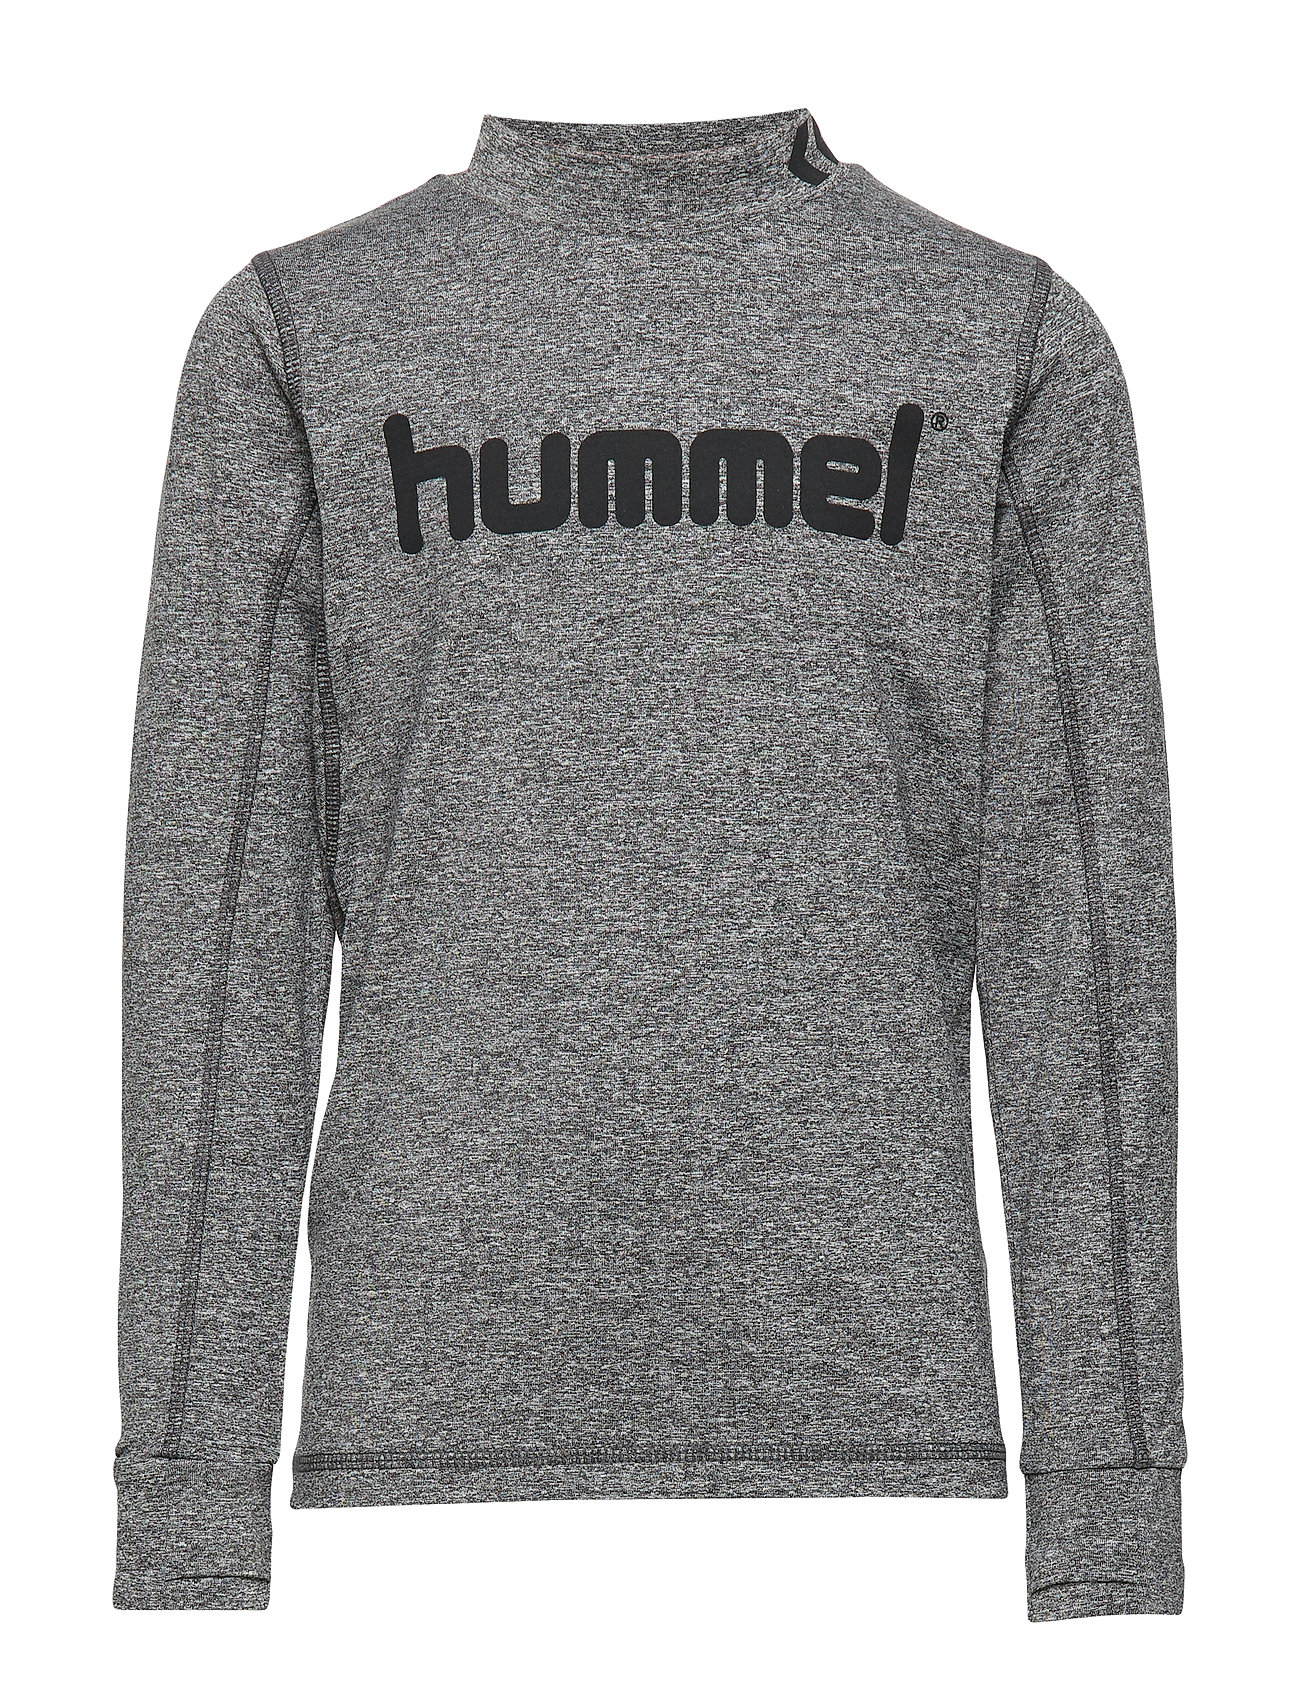 Hummel hmlASK SWEATSHIRT - MEDIUM MELANGE